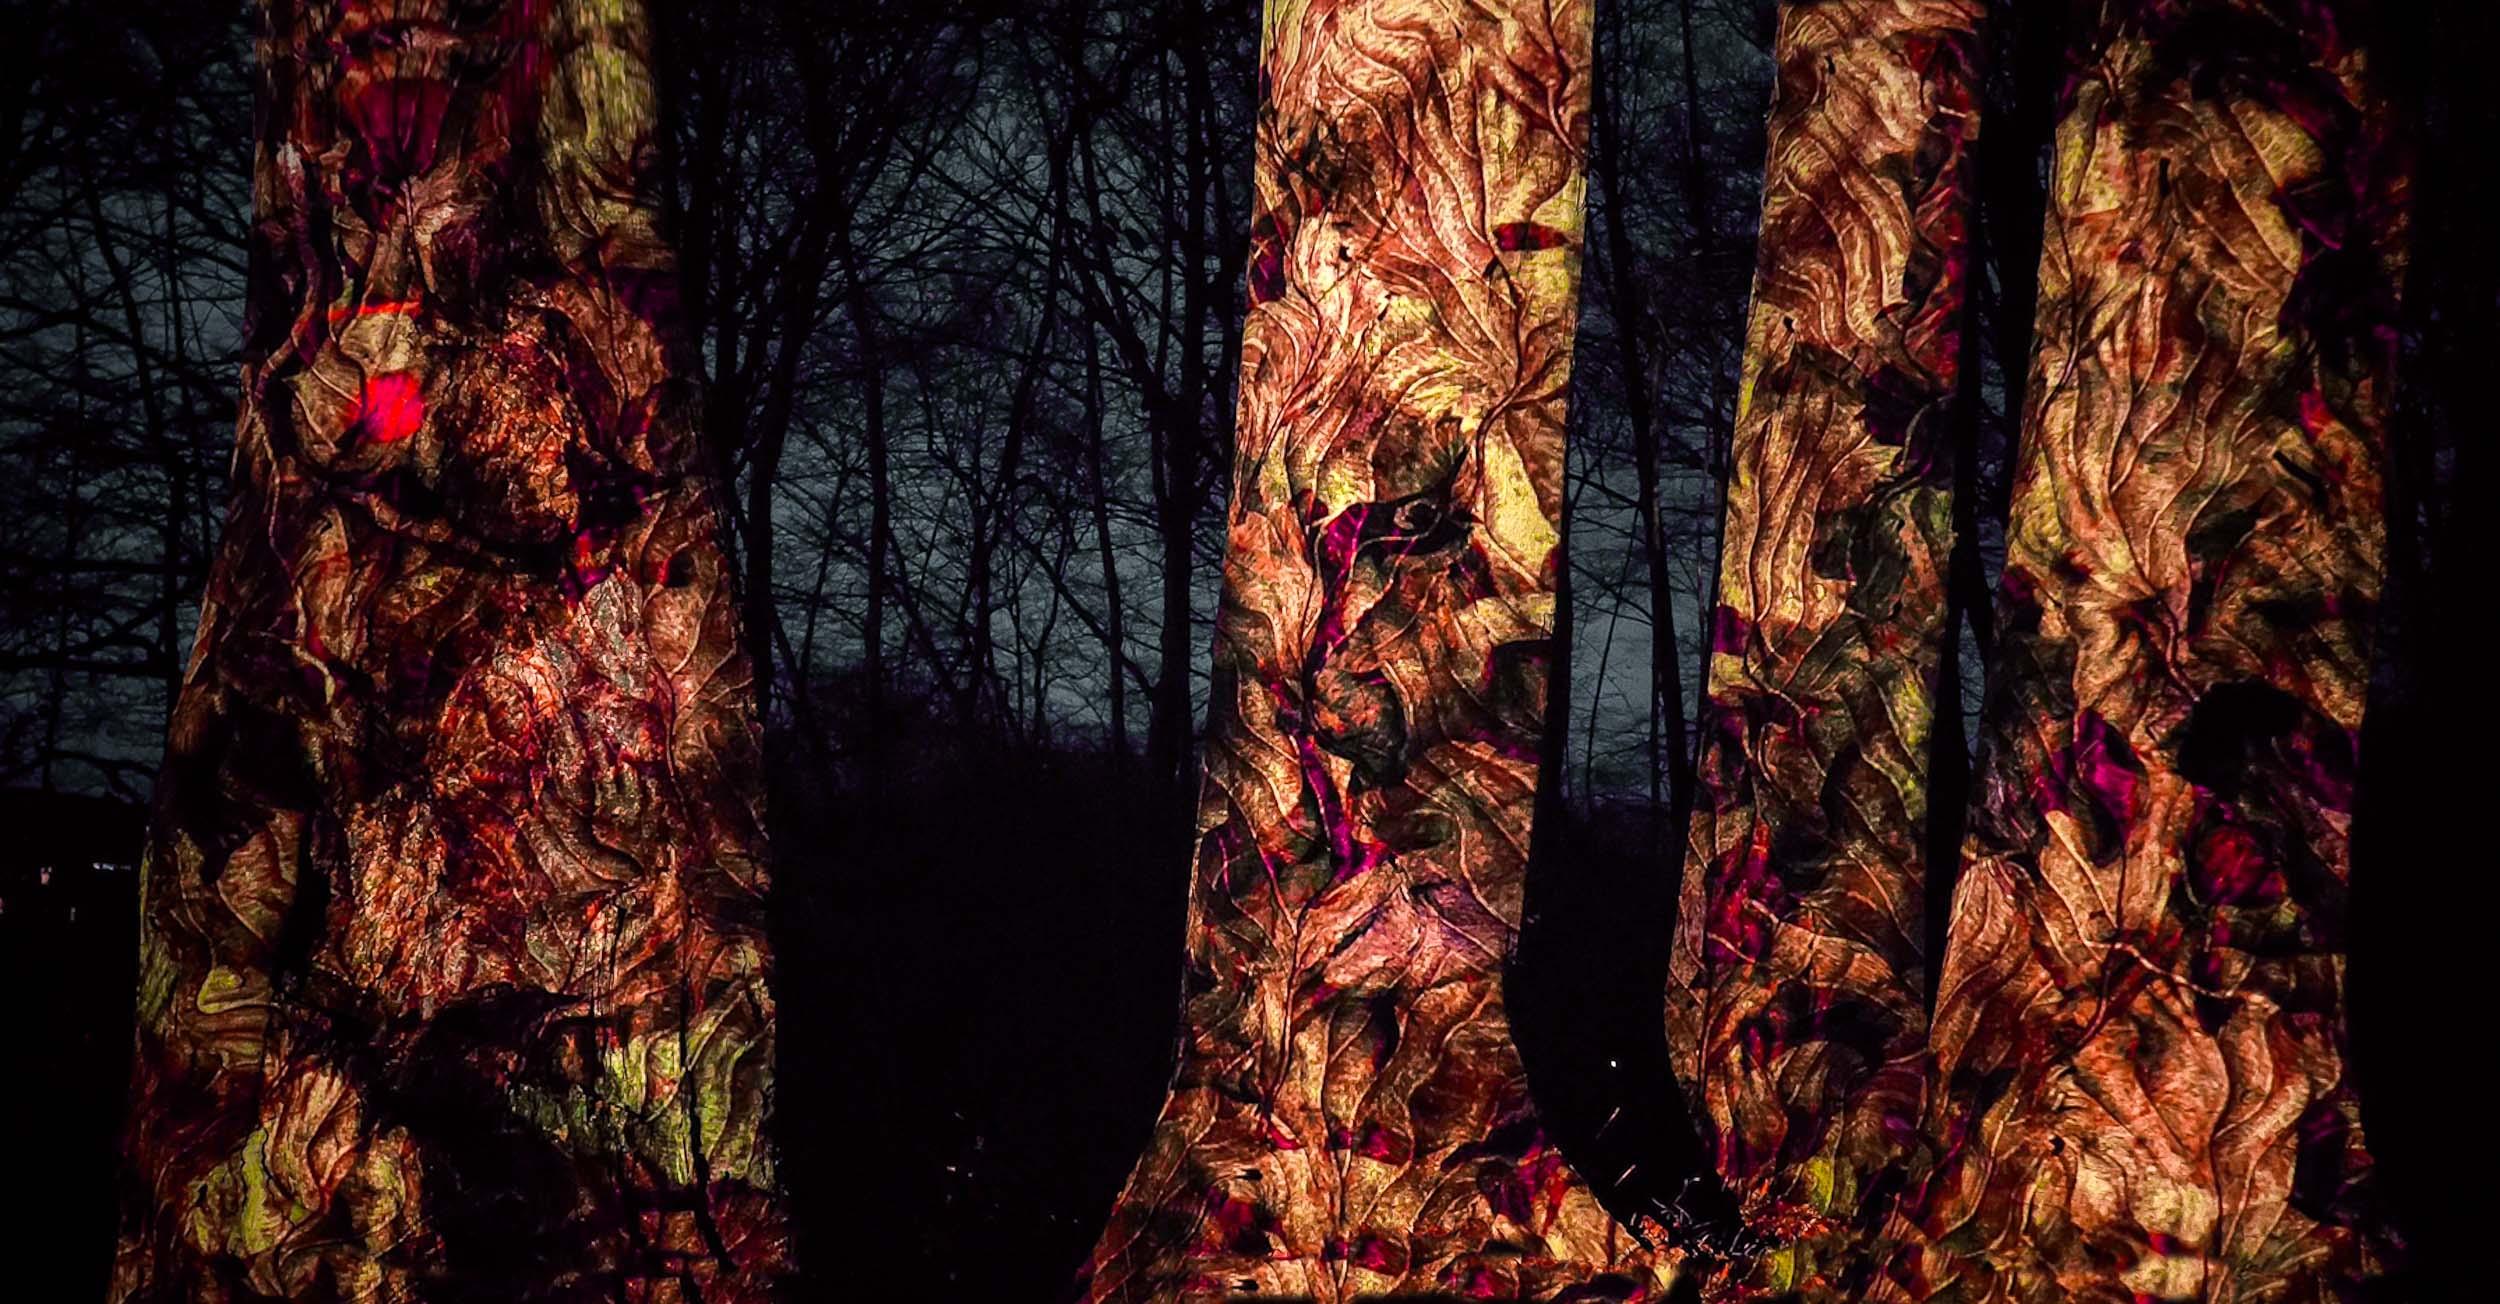 Lumatar, Philipp Frank, Isar, München, Munich, Designer, Video Art, Installation Art, Light art, projection mapping, artist, Video Künstler, Lichtkünstler